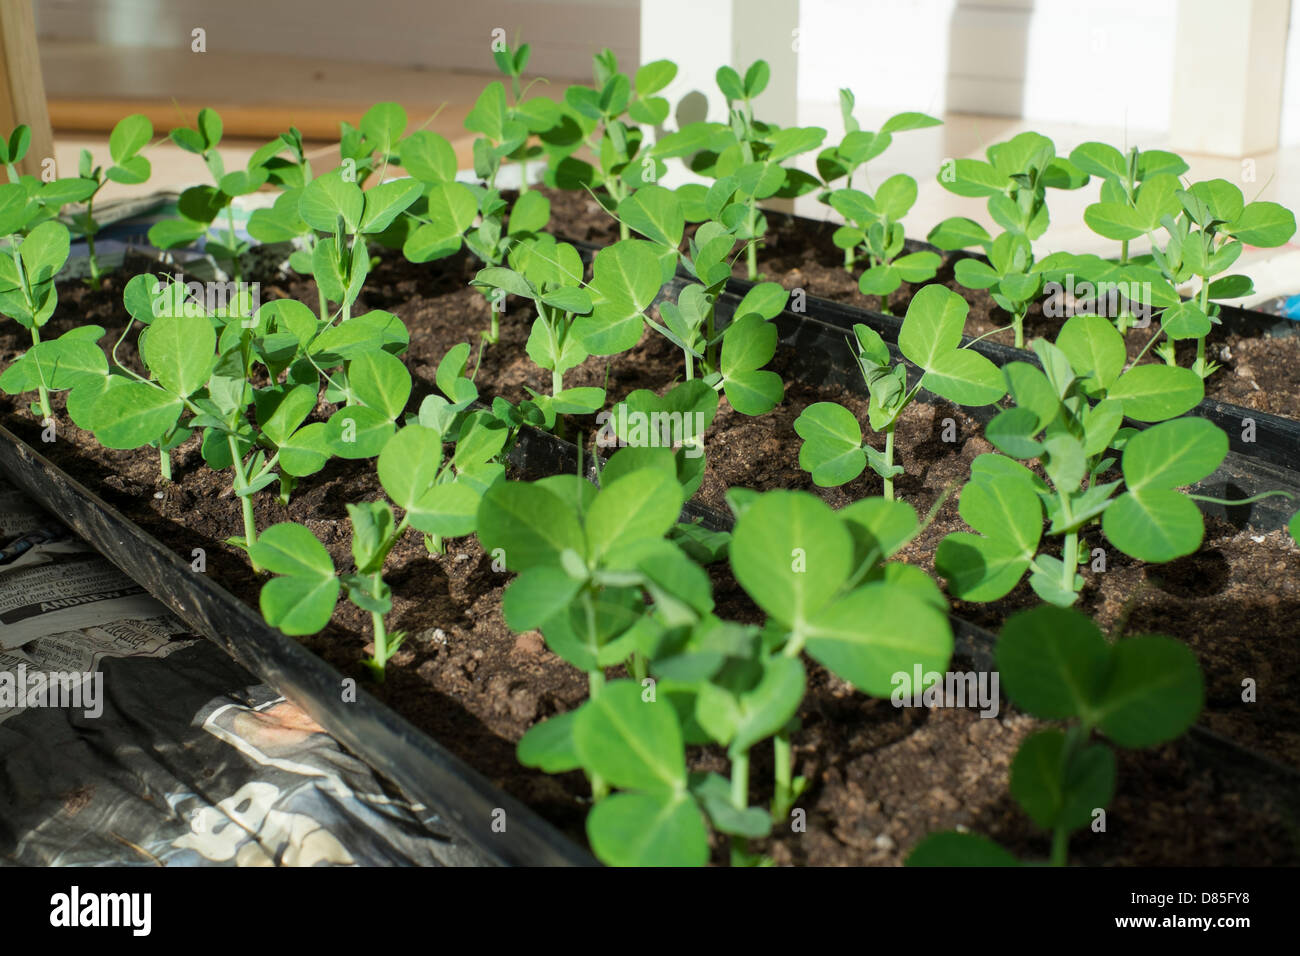 Growing your own food, garden pea seedlings. - Stock Image